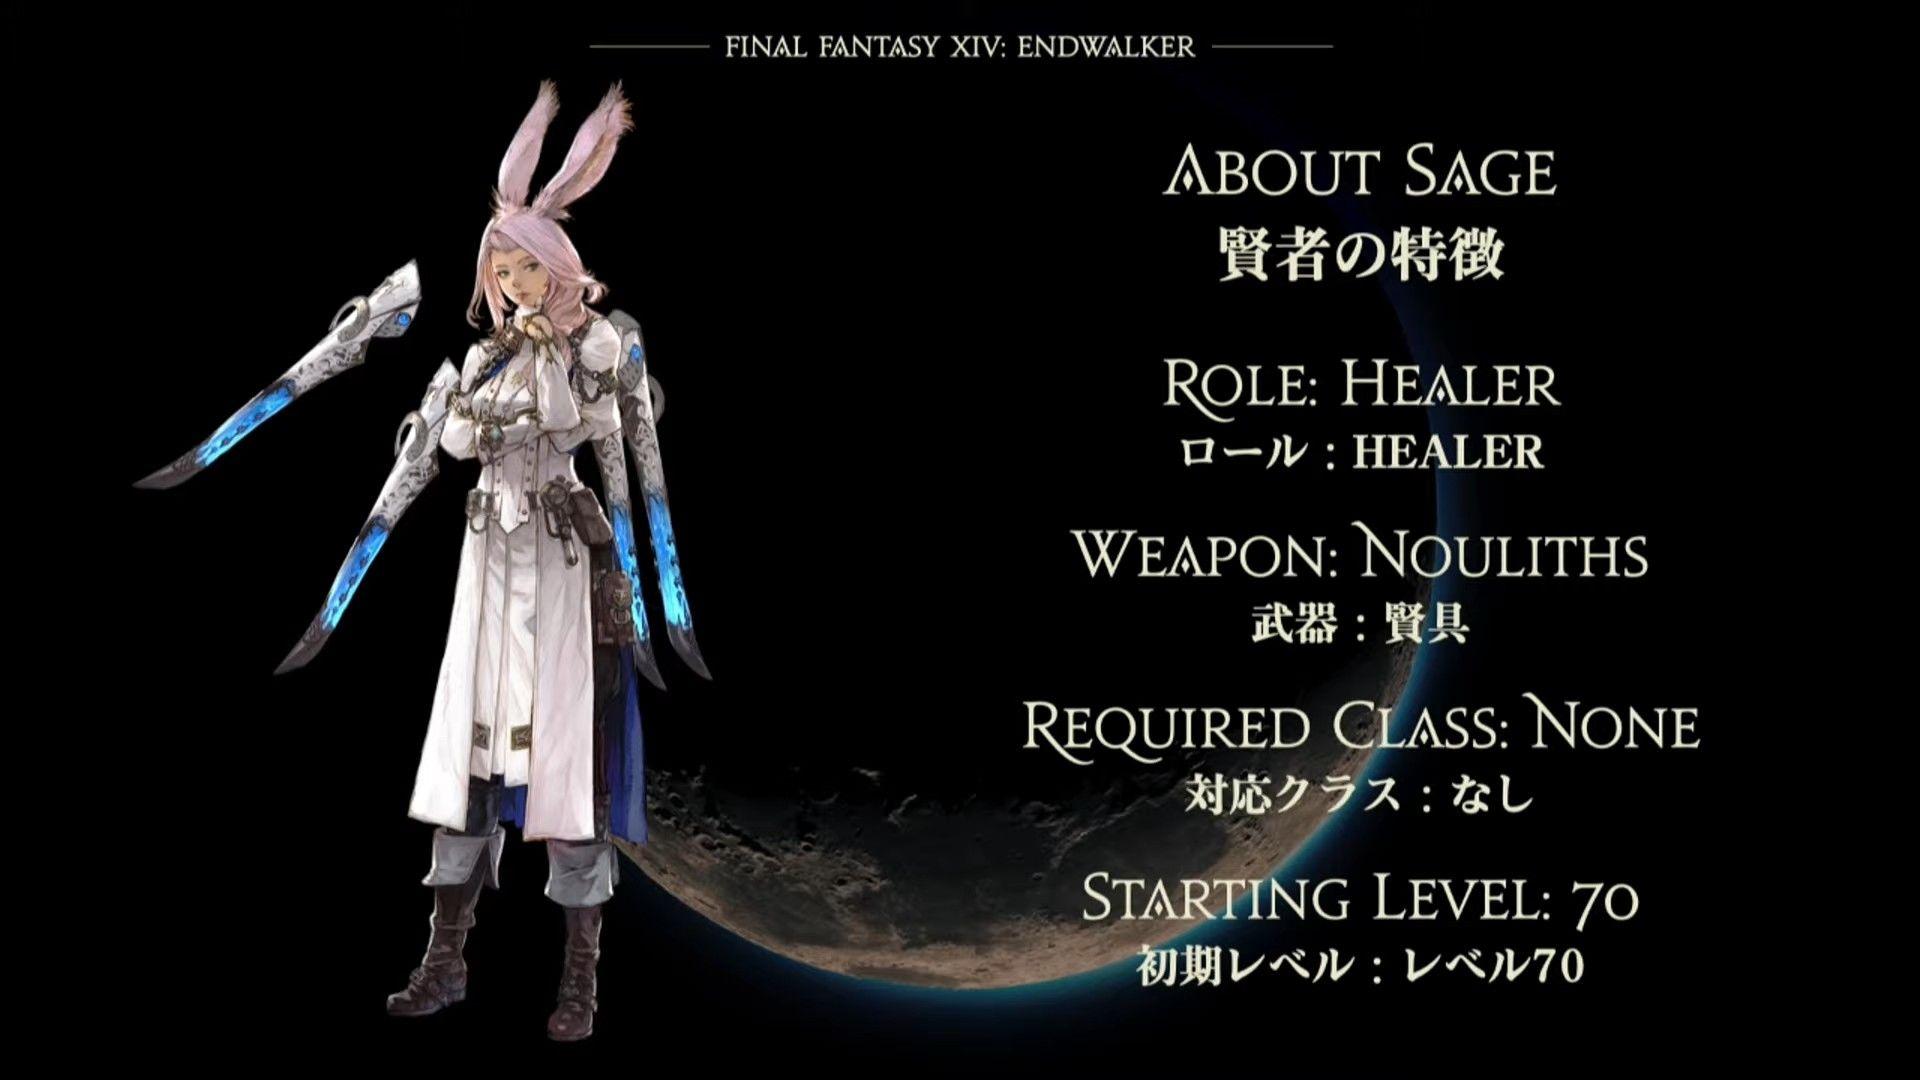 Final Fantasy XIV: Endwalker genişlemesi duyuruldu